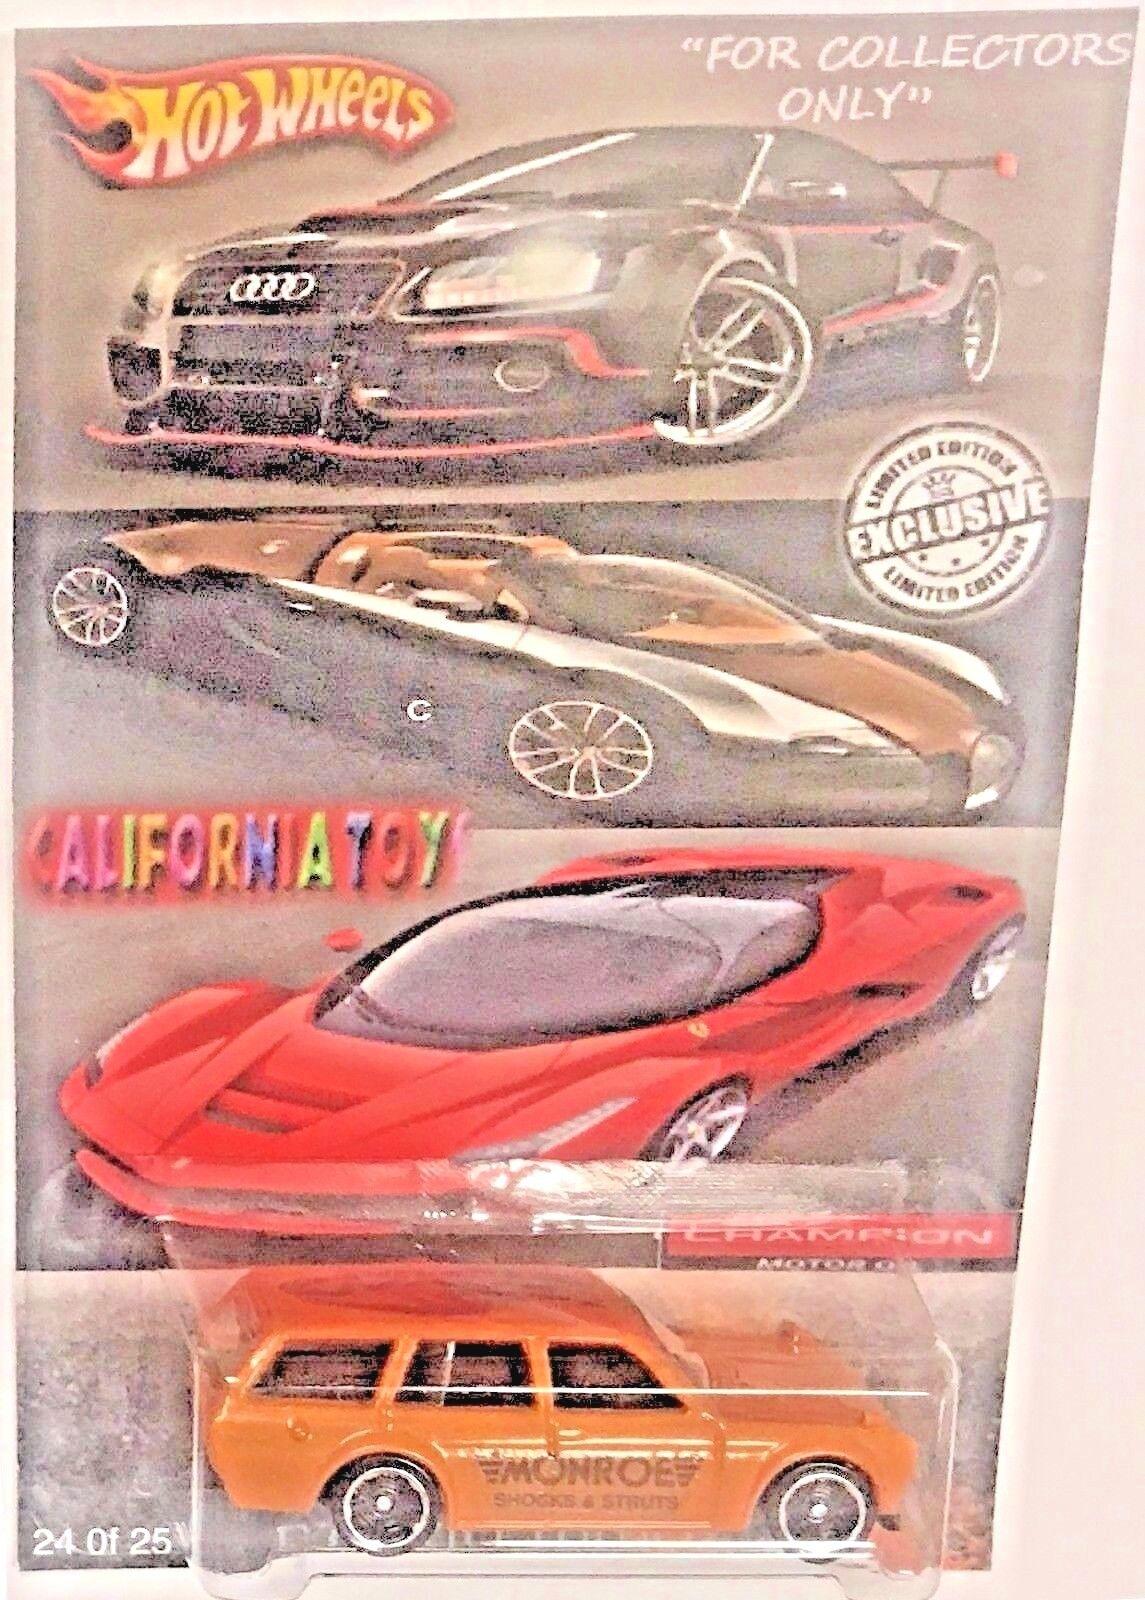 Hot Wheels 510 Datsun Wagon California Toys Limited Edition Die cast Custom